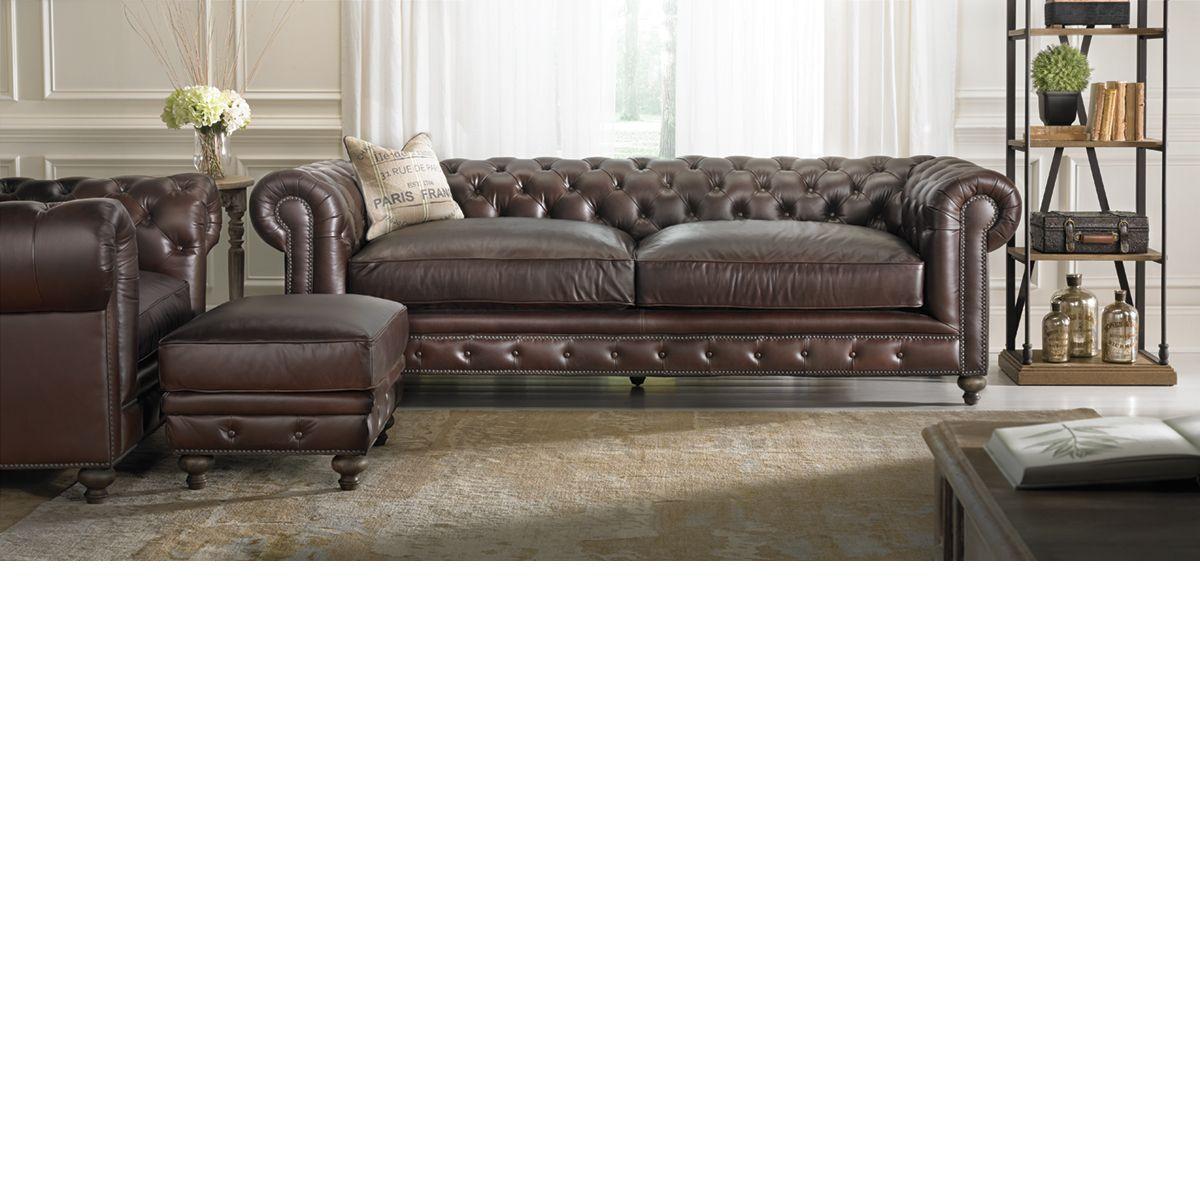 The Dump Furniture - FRANCIS DRAKE LEATHER SOFA | Home: Apartment ...